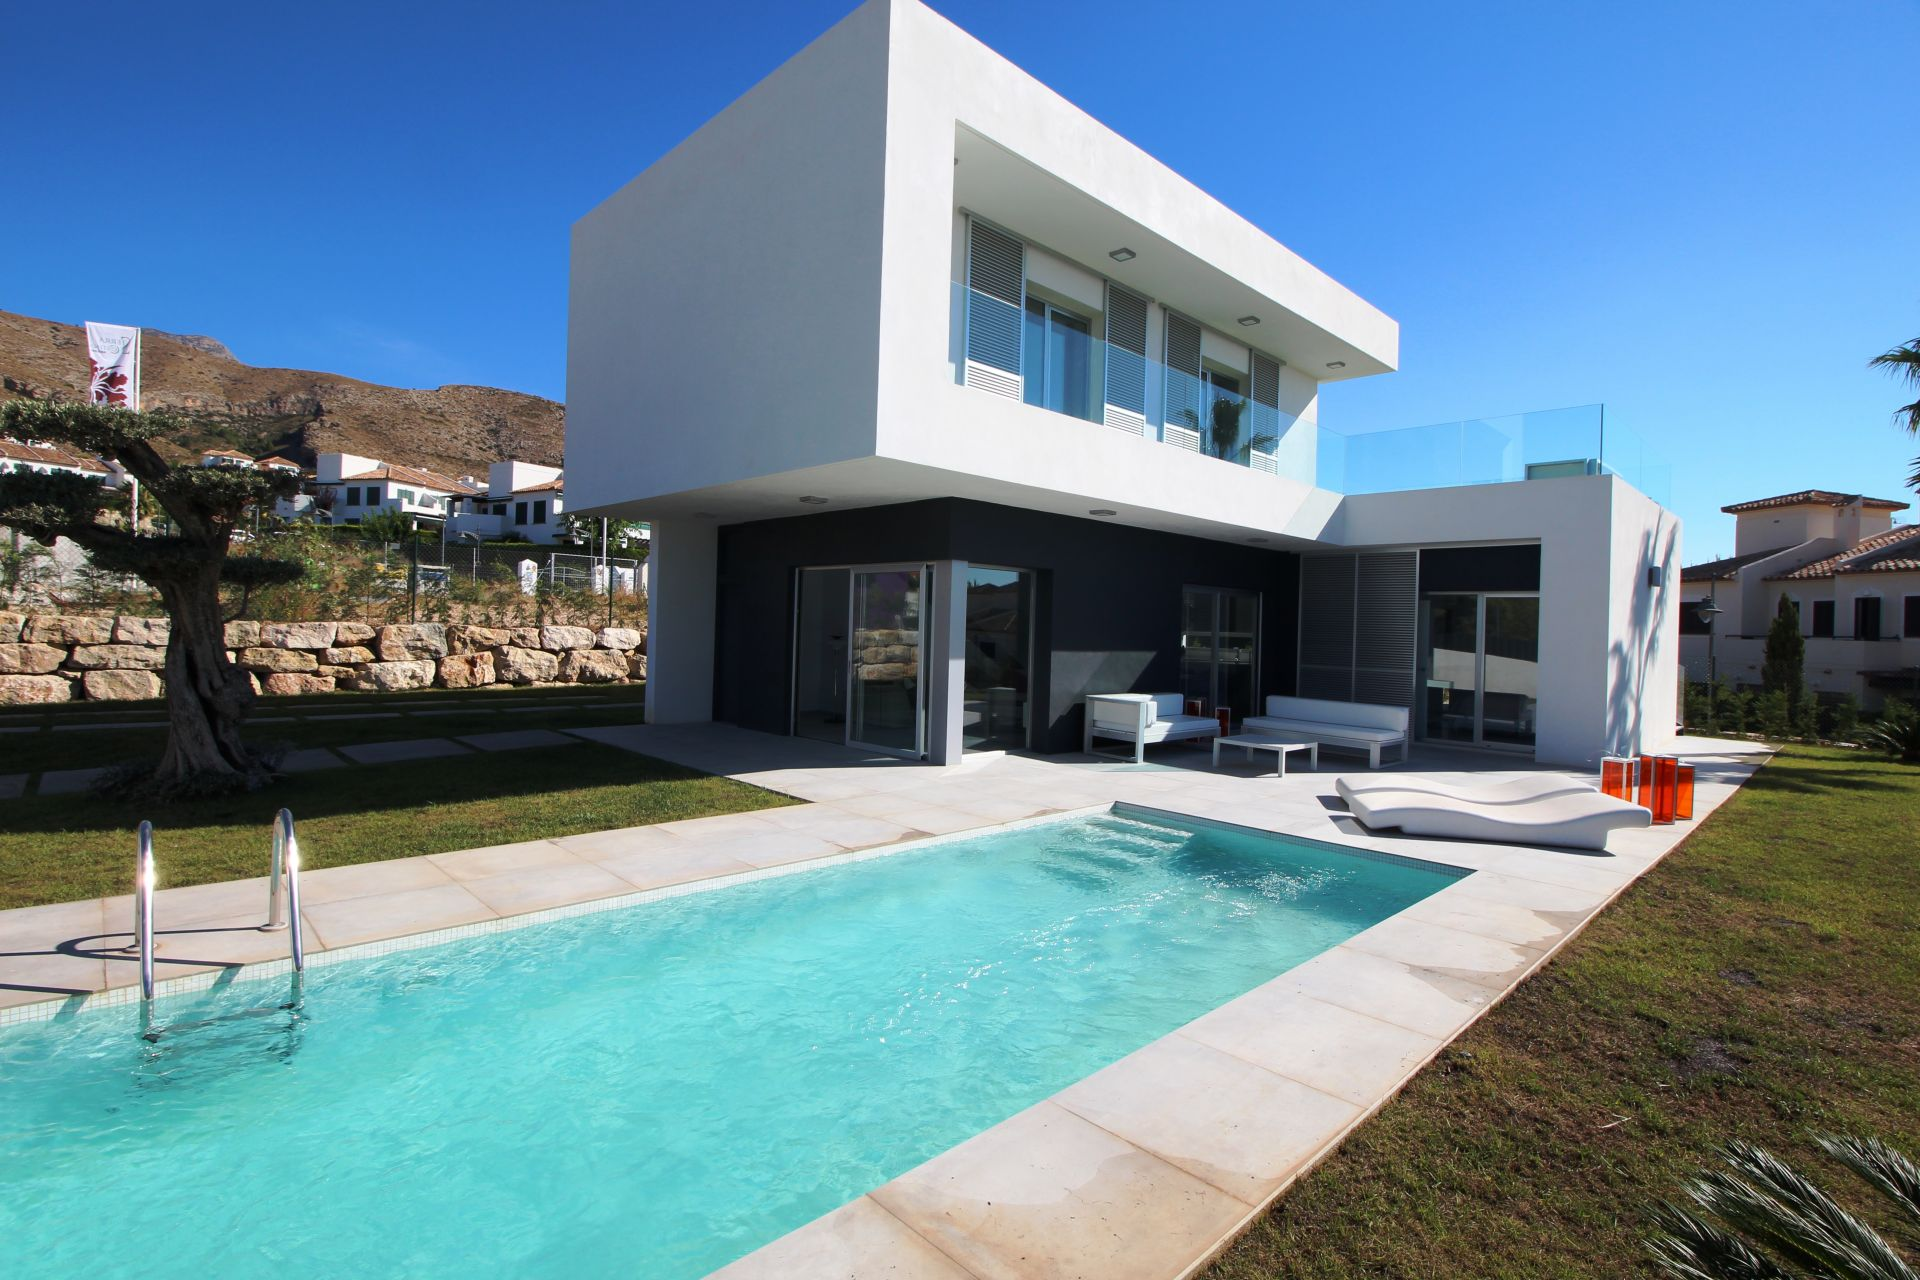 Exclusive villas with 3 bedrooms in Finestrat 1